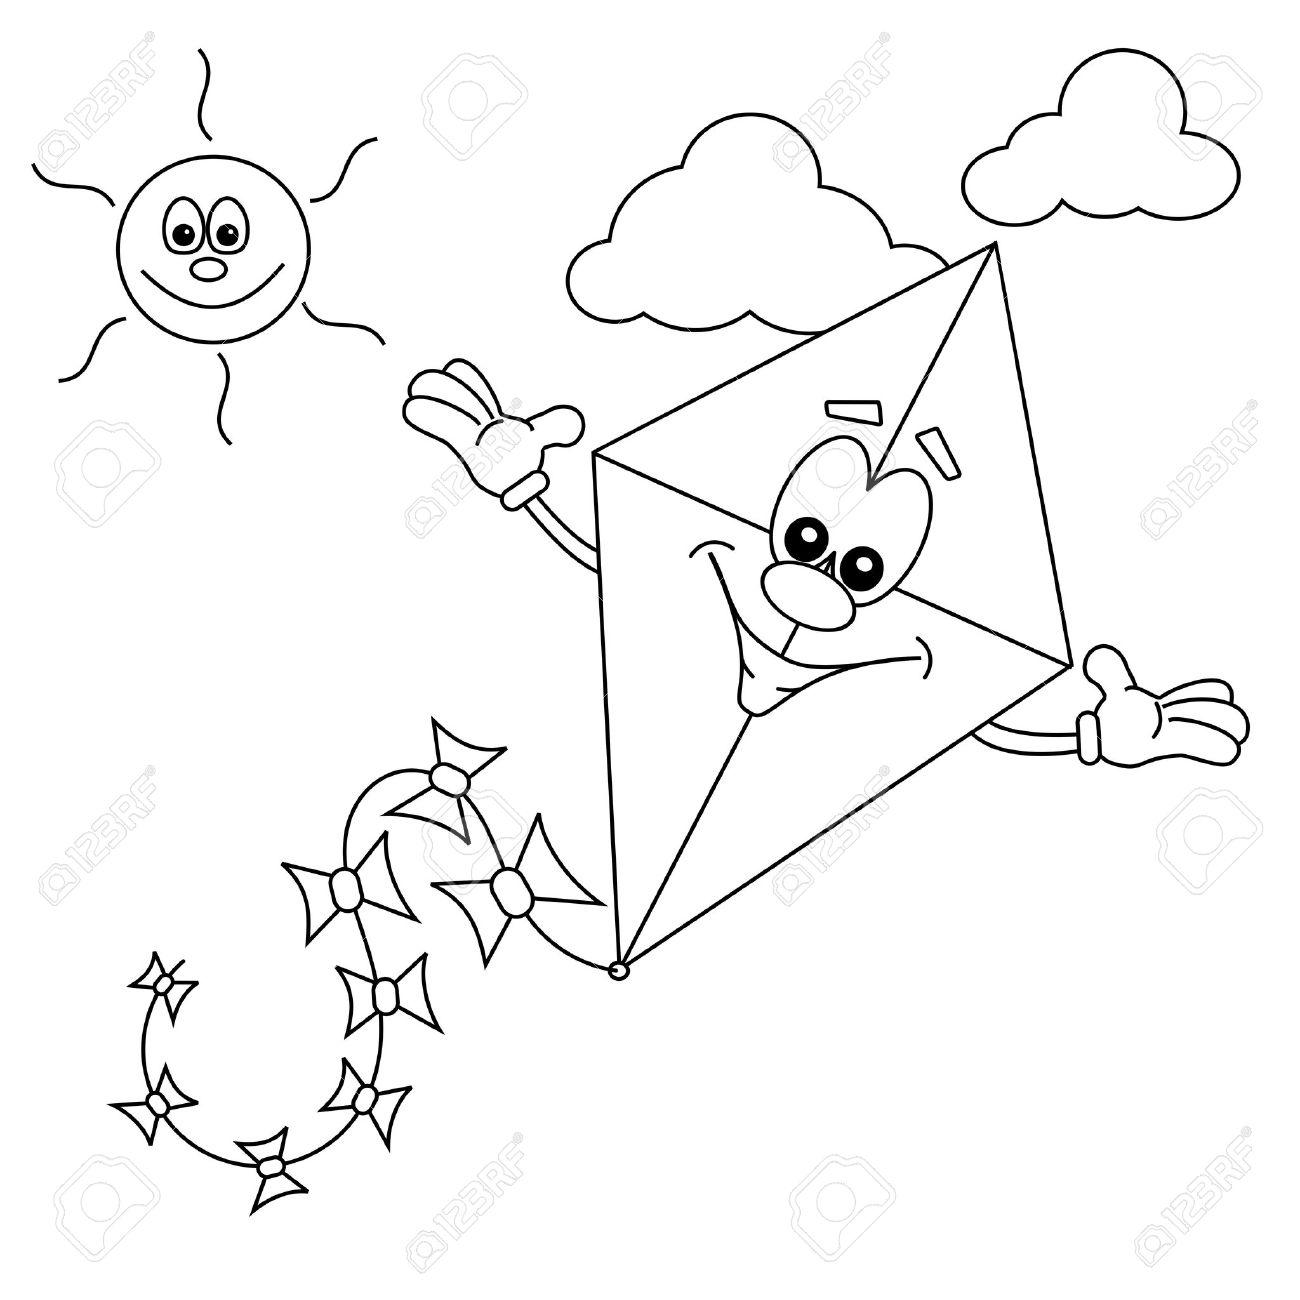 Kite Flying Drawing At Getdrawings